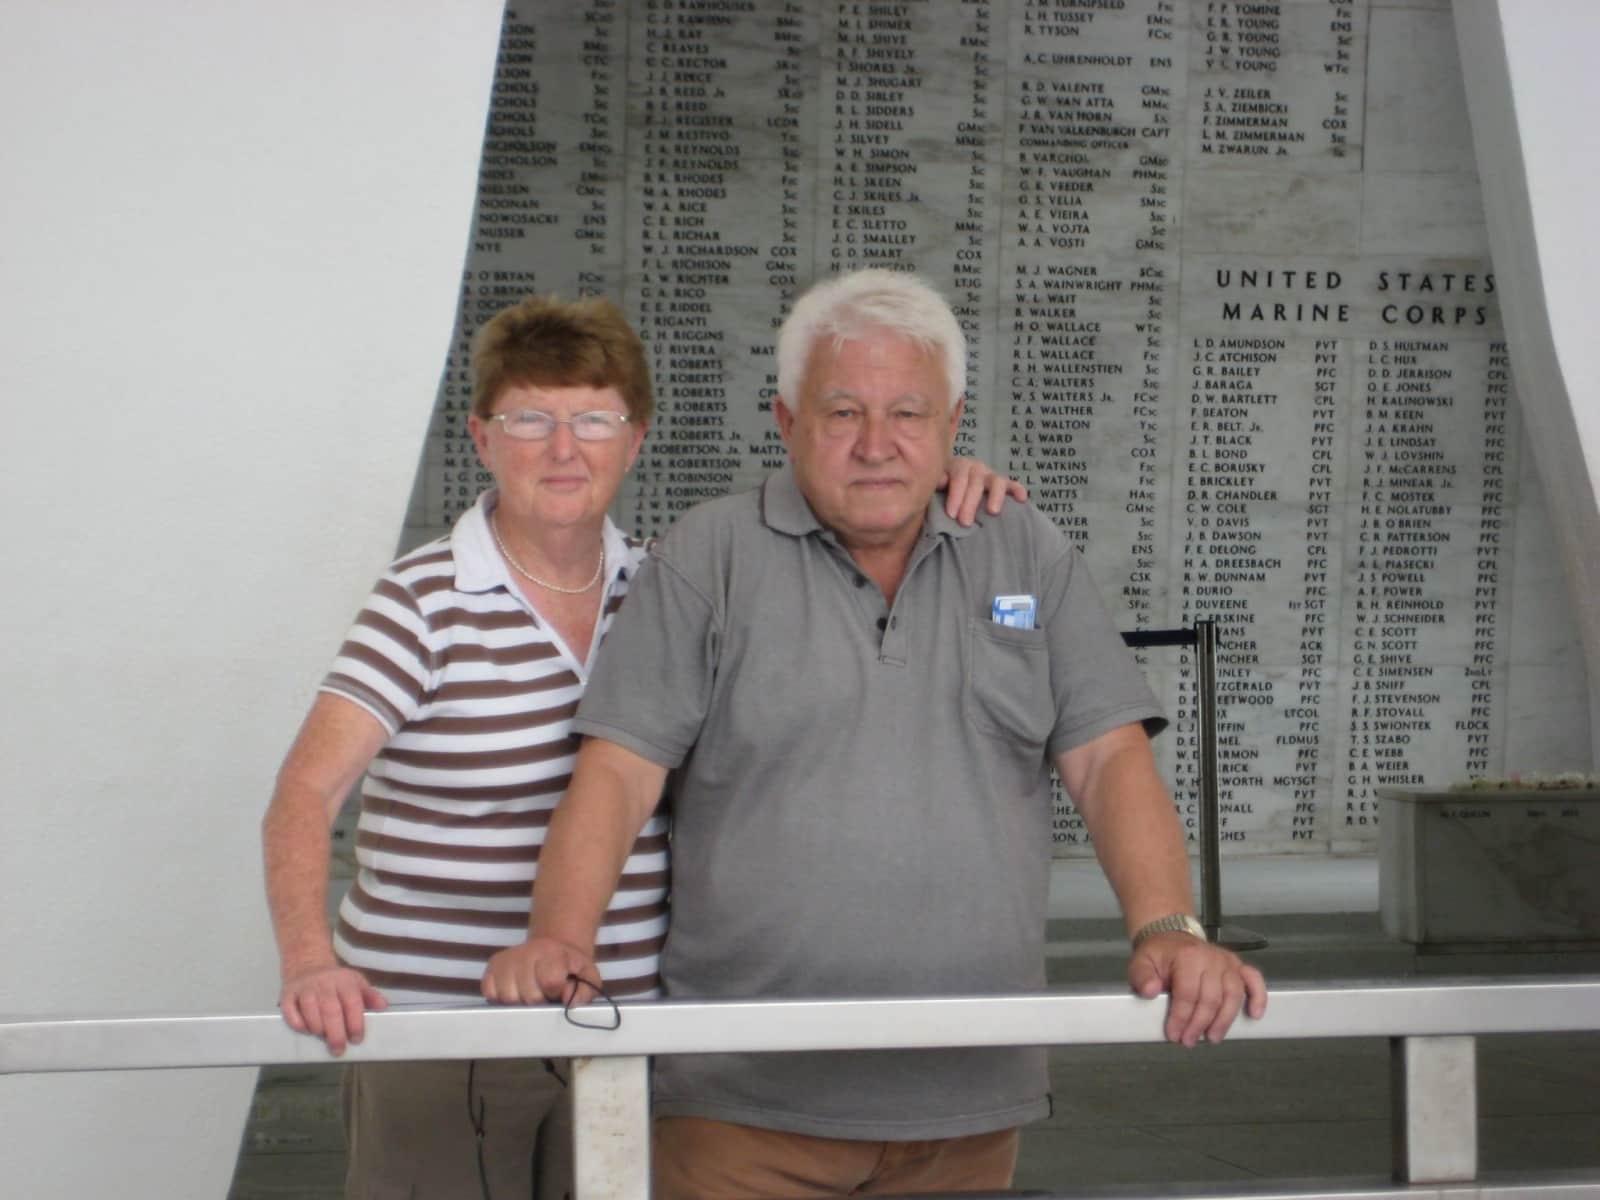 Colleen & Ginter from Moonta Bay, South Australia, Australia